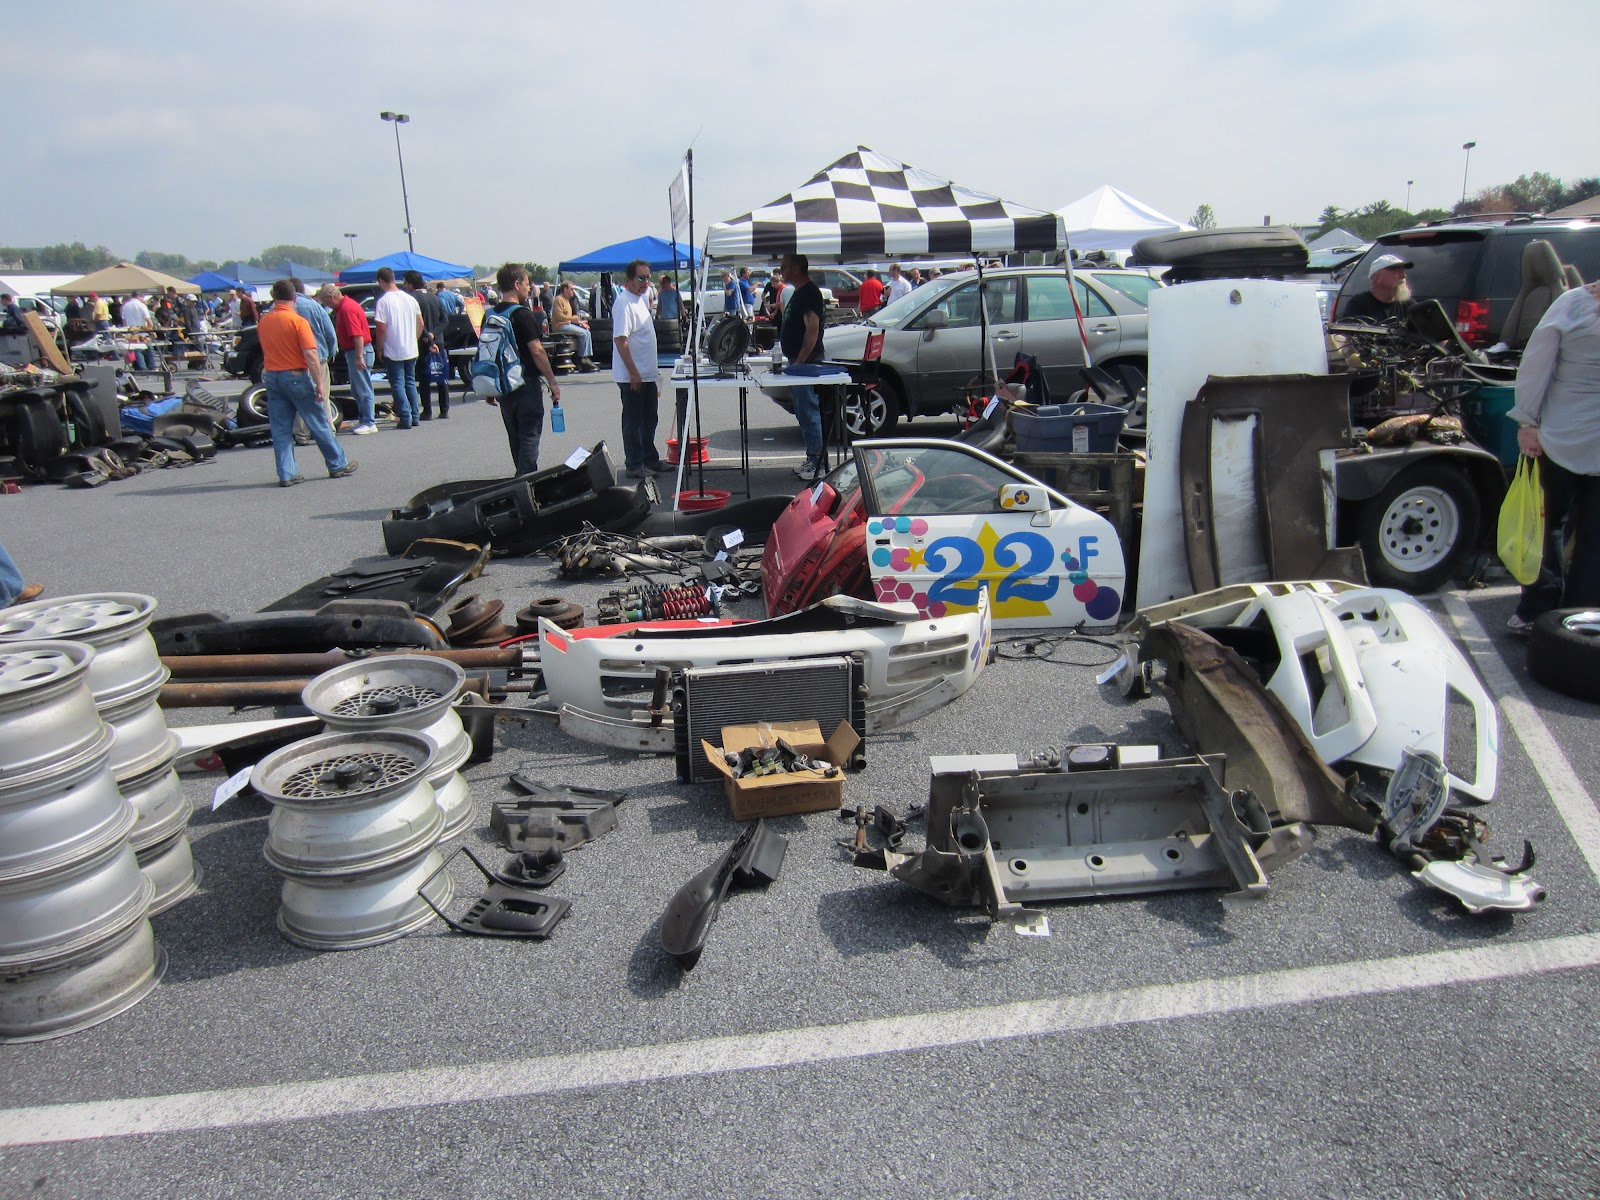 Hershey Pa Car Show And Swap Meet